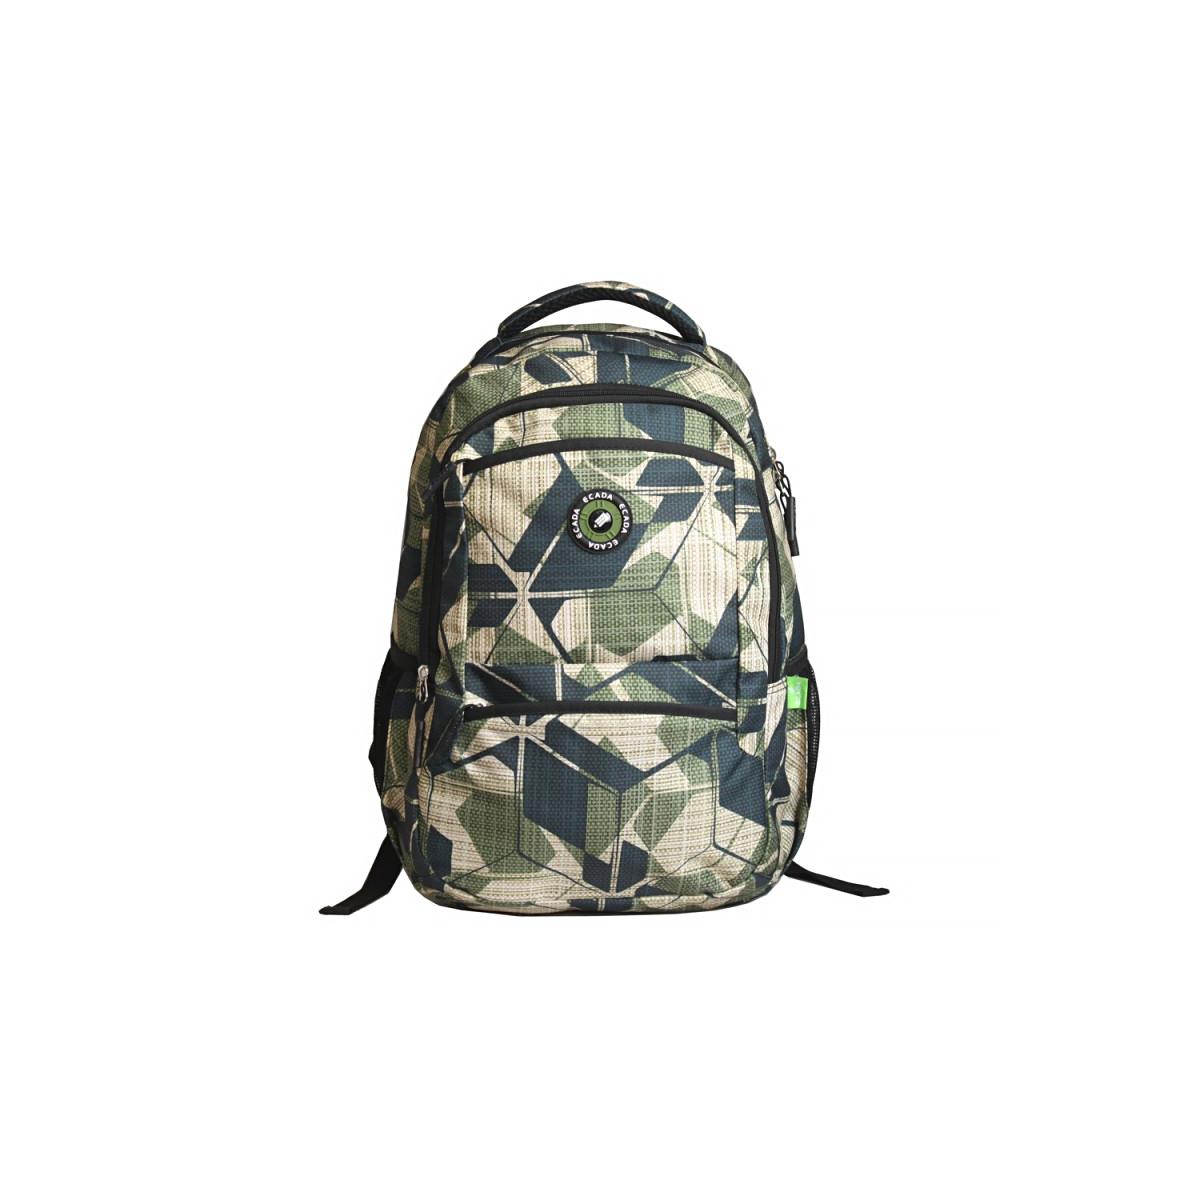 Ghiozdan Școlar Pentru Adolescenți, Verde, Army, Ecada, 61462